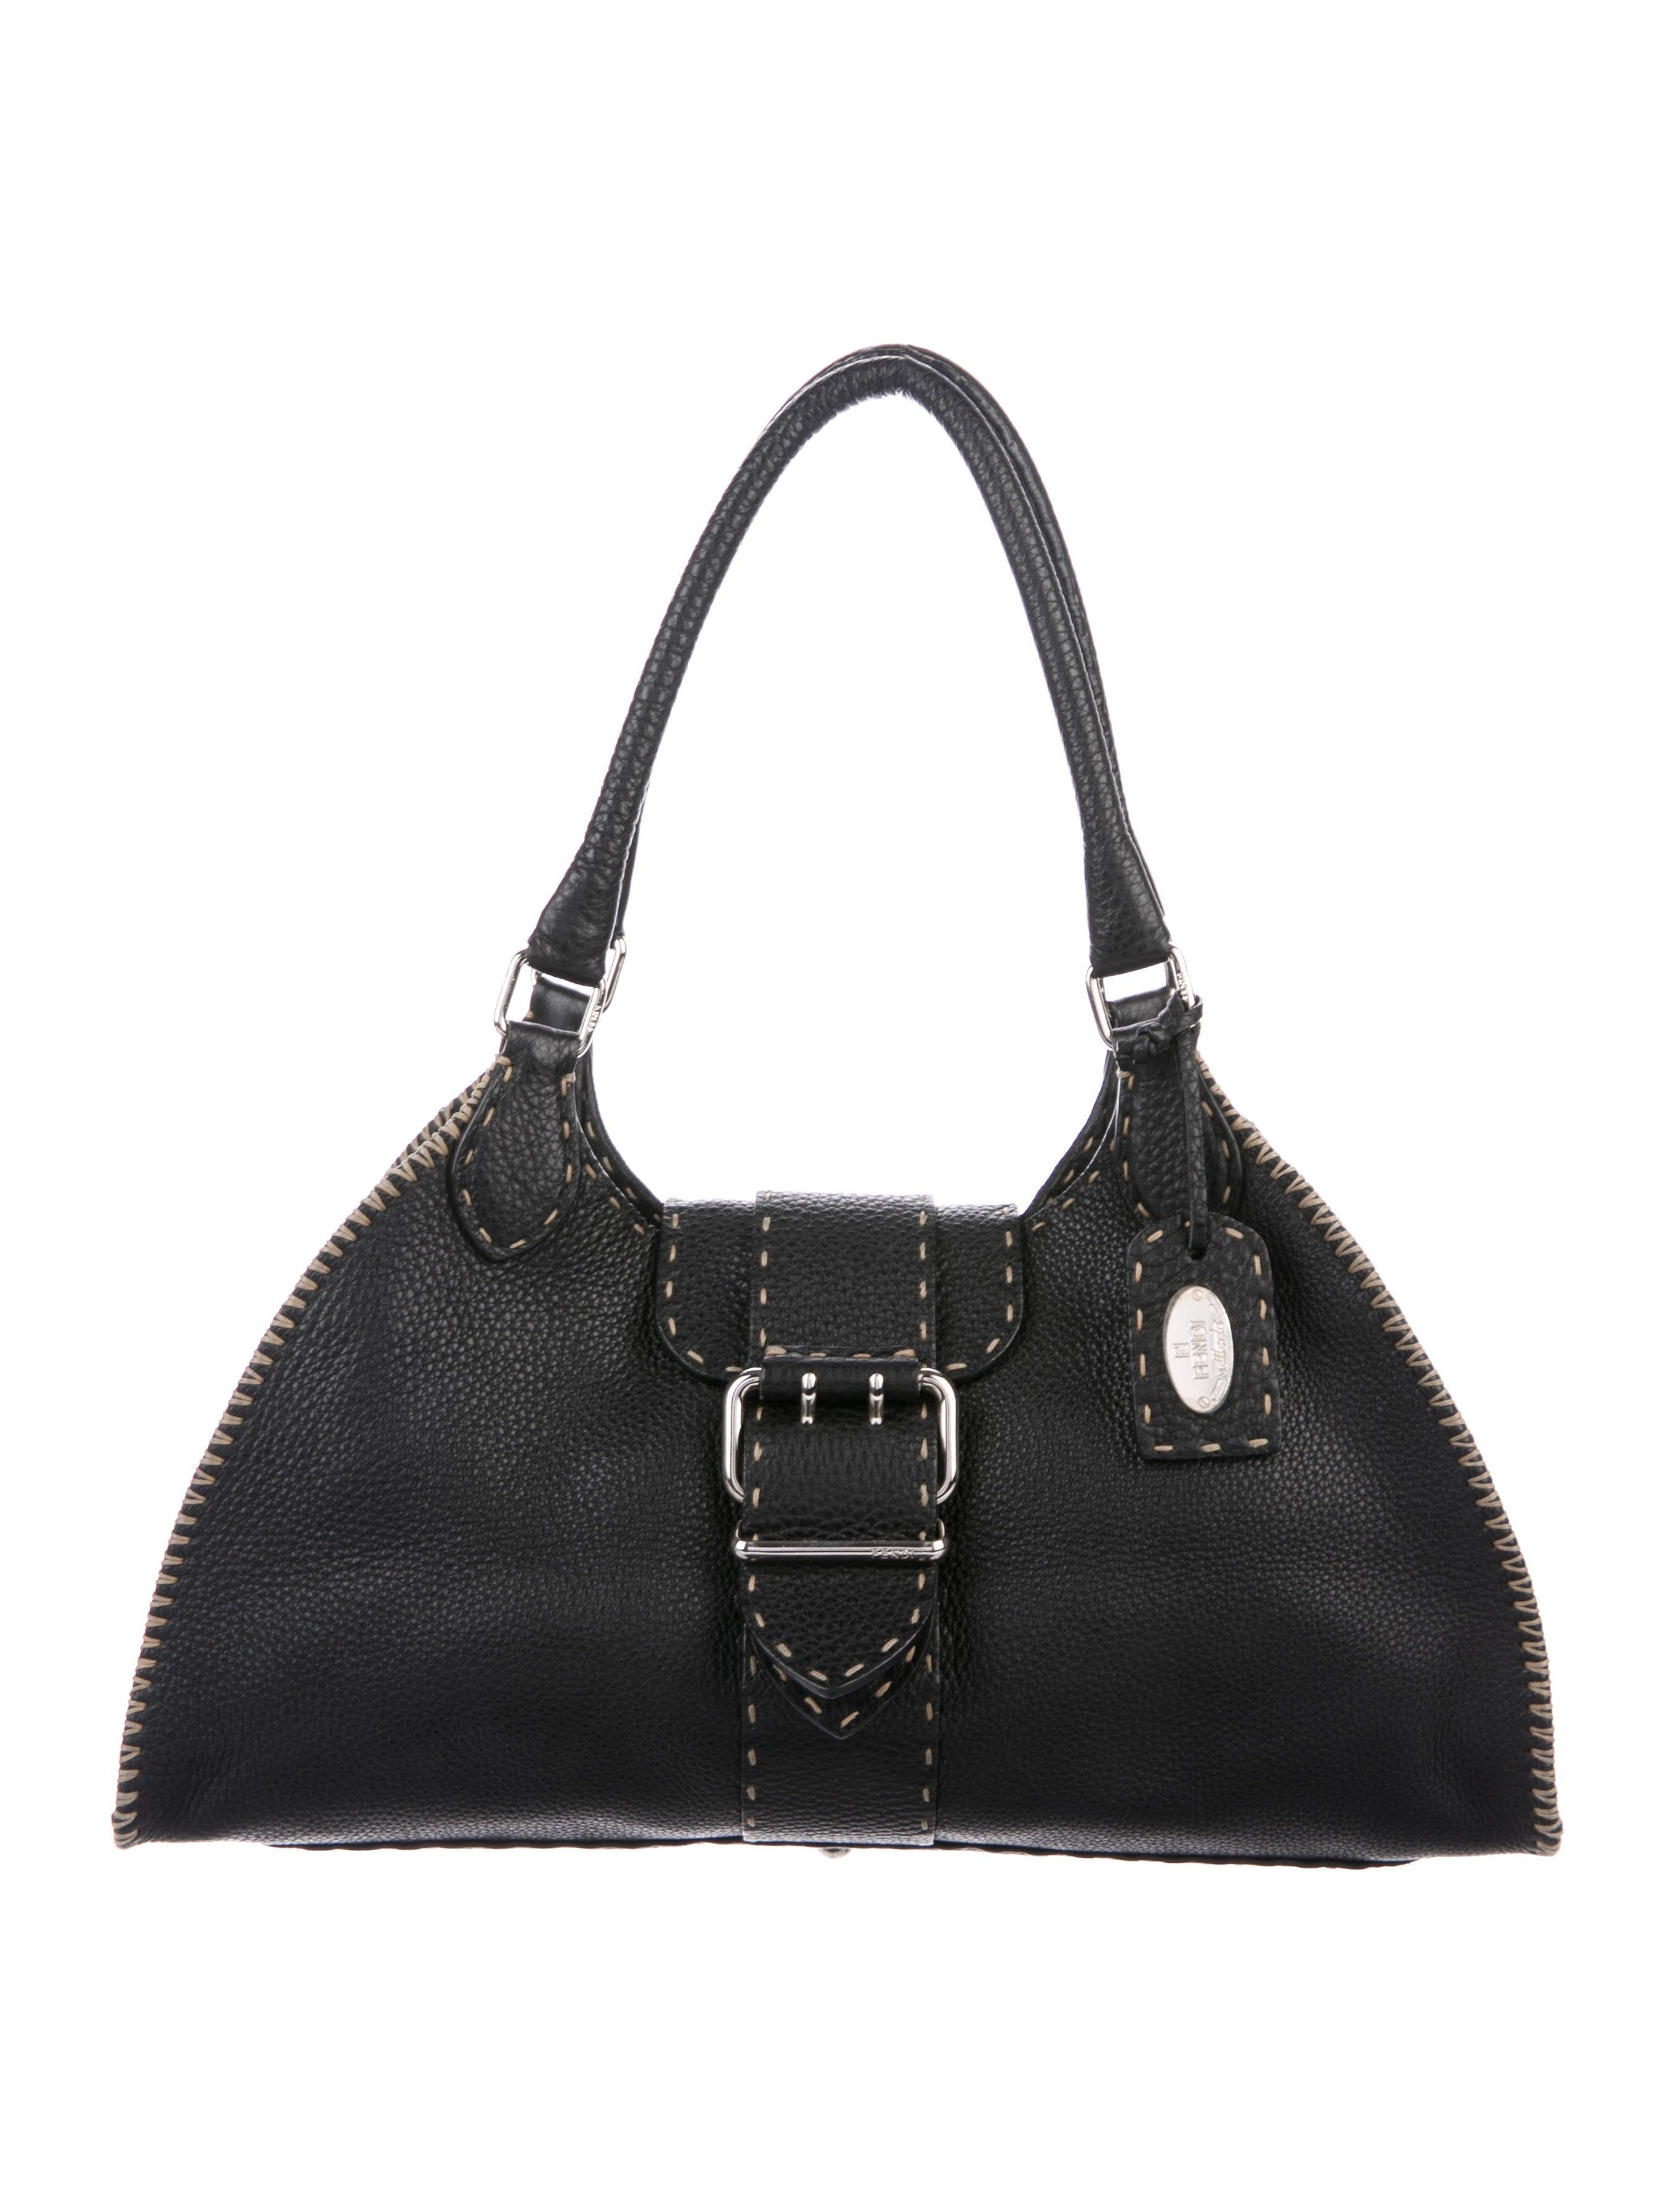 29fed8530d7e Fendi Selleria Sporty Bag - Handbags - FEN86928